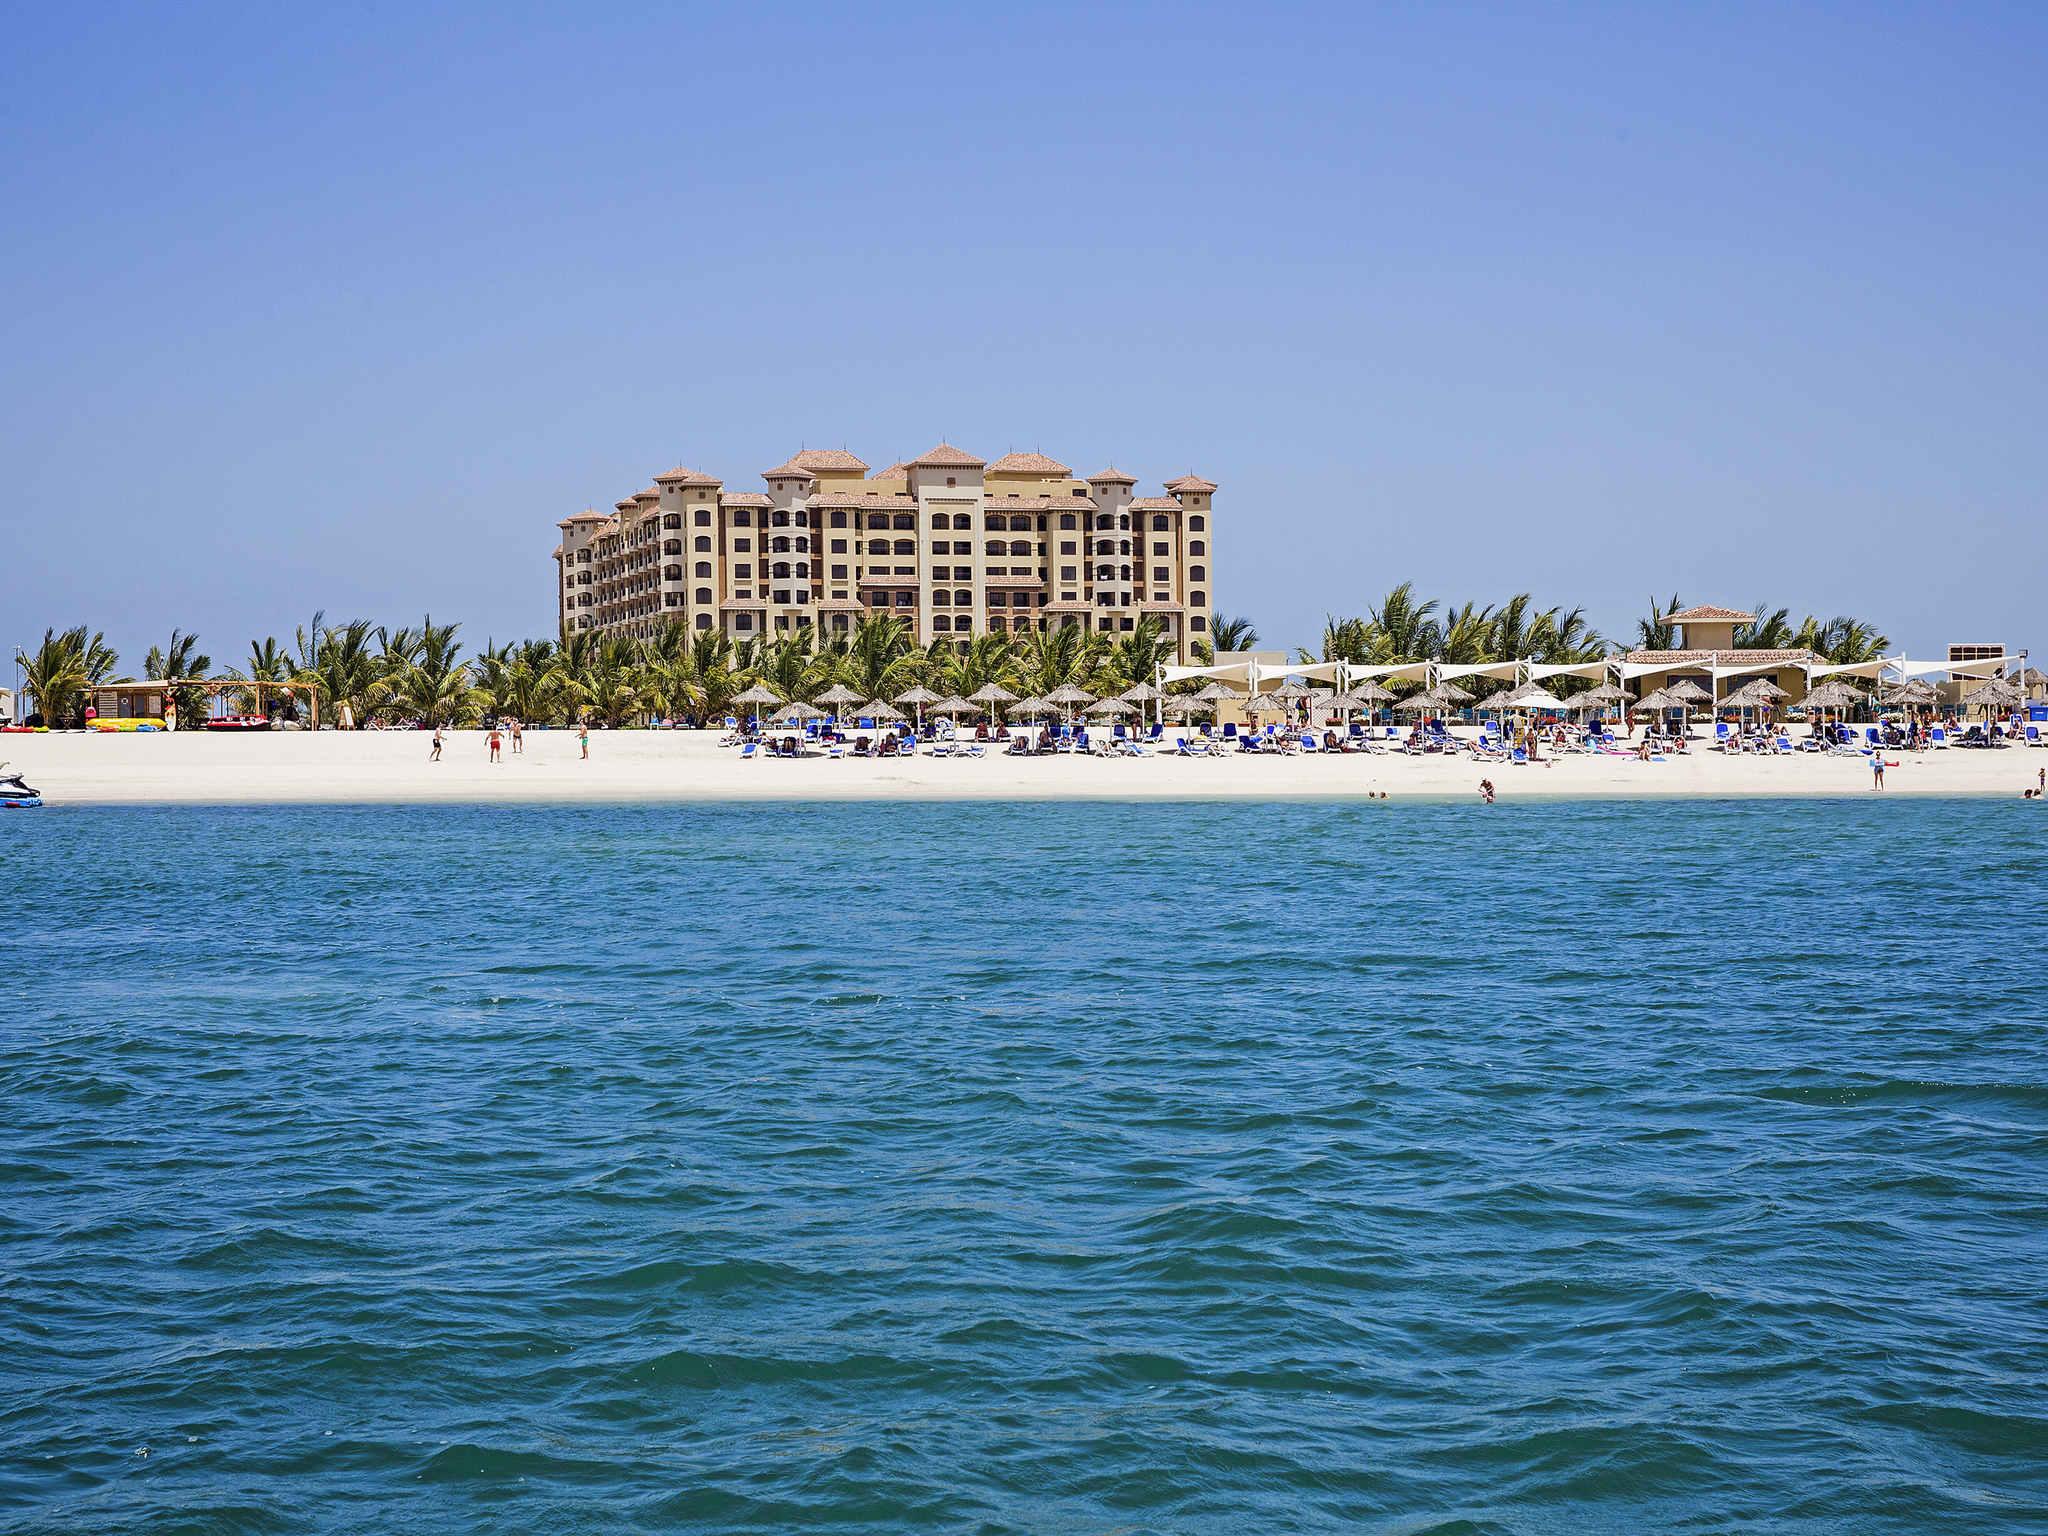 Hotel - Marjan Island Resort & Spa - Managed by AccorHotels